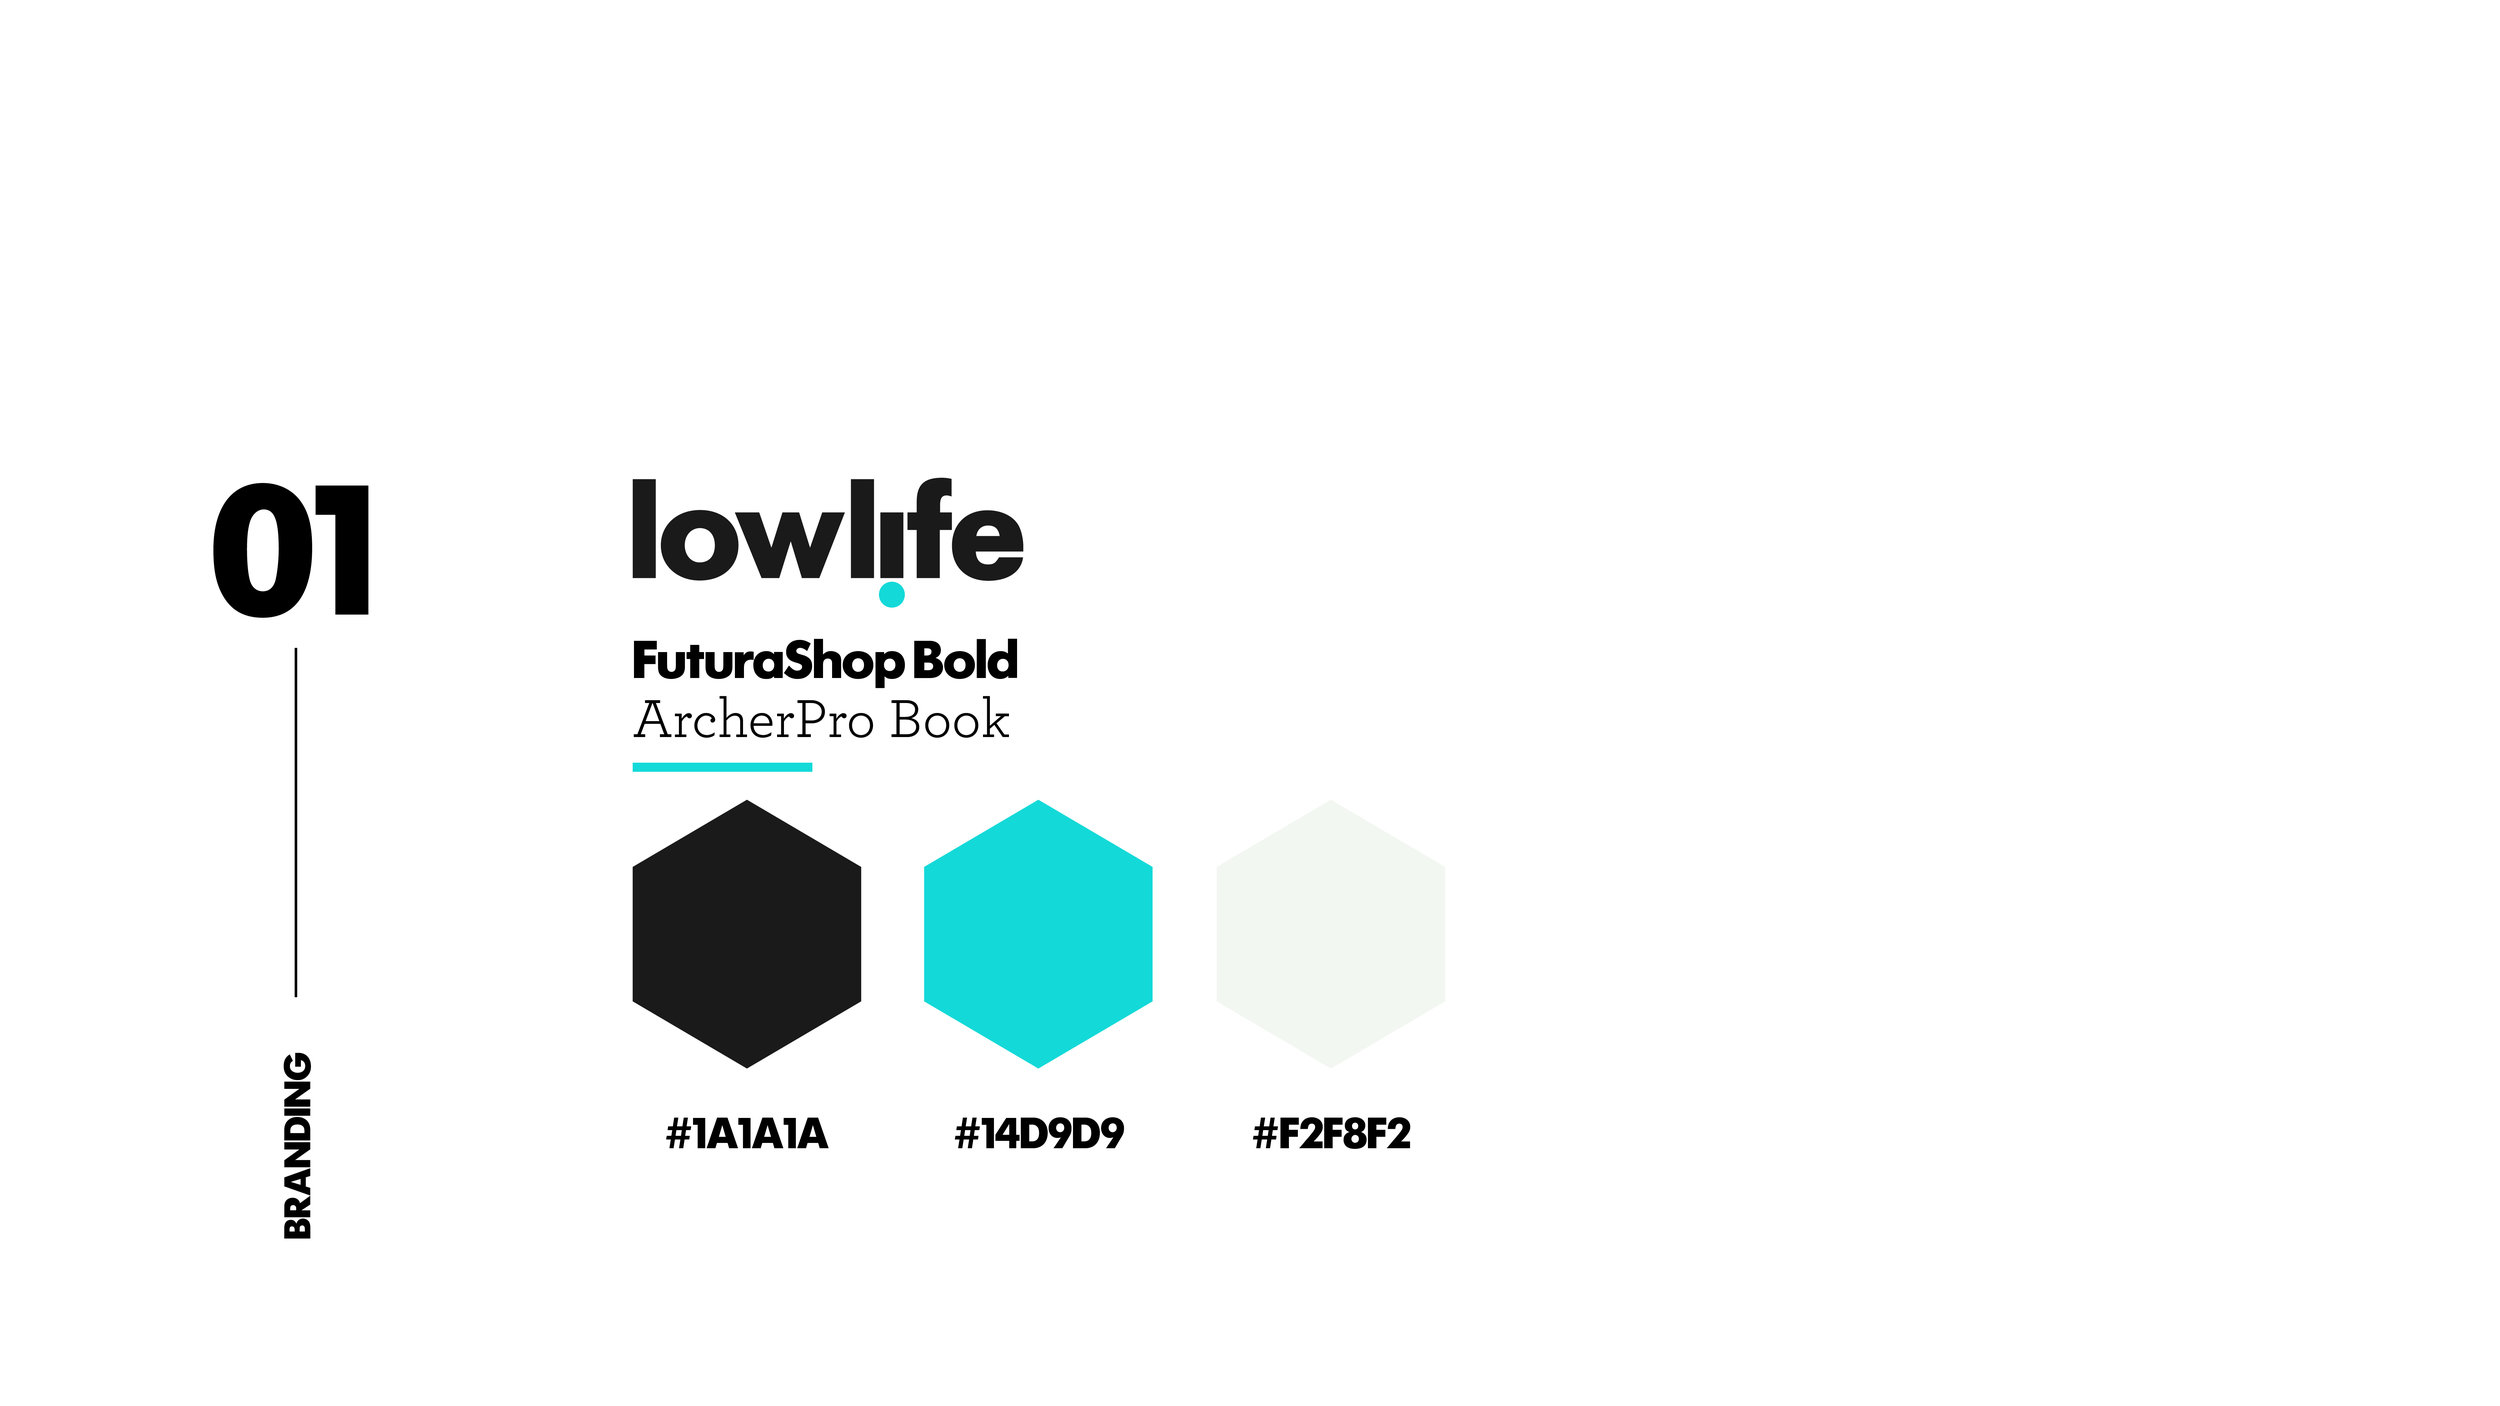 LOWLIFE_BrandColorsLayout.jpg